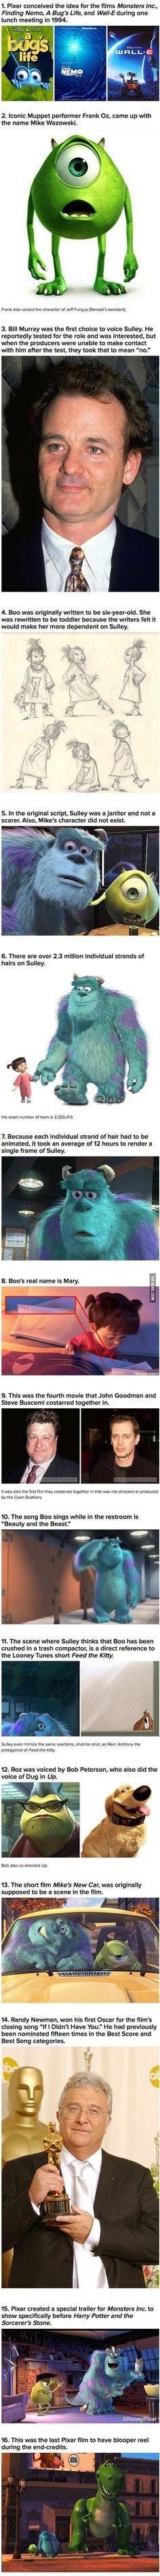 Fun Disney Pixar Monsters inc facts